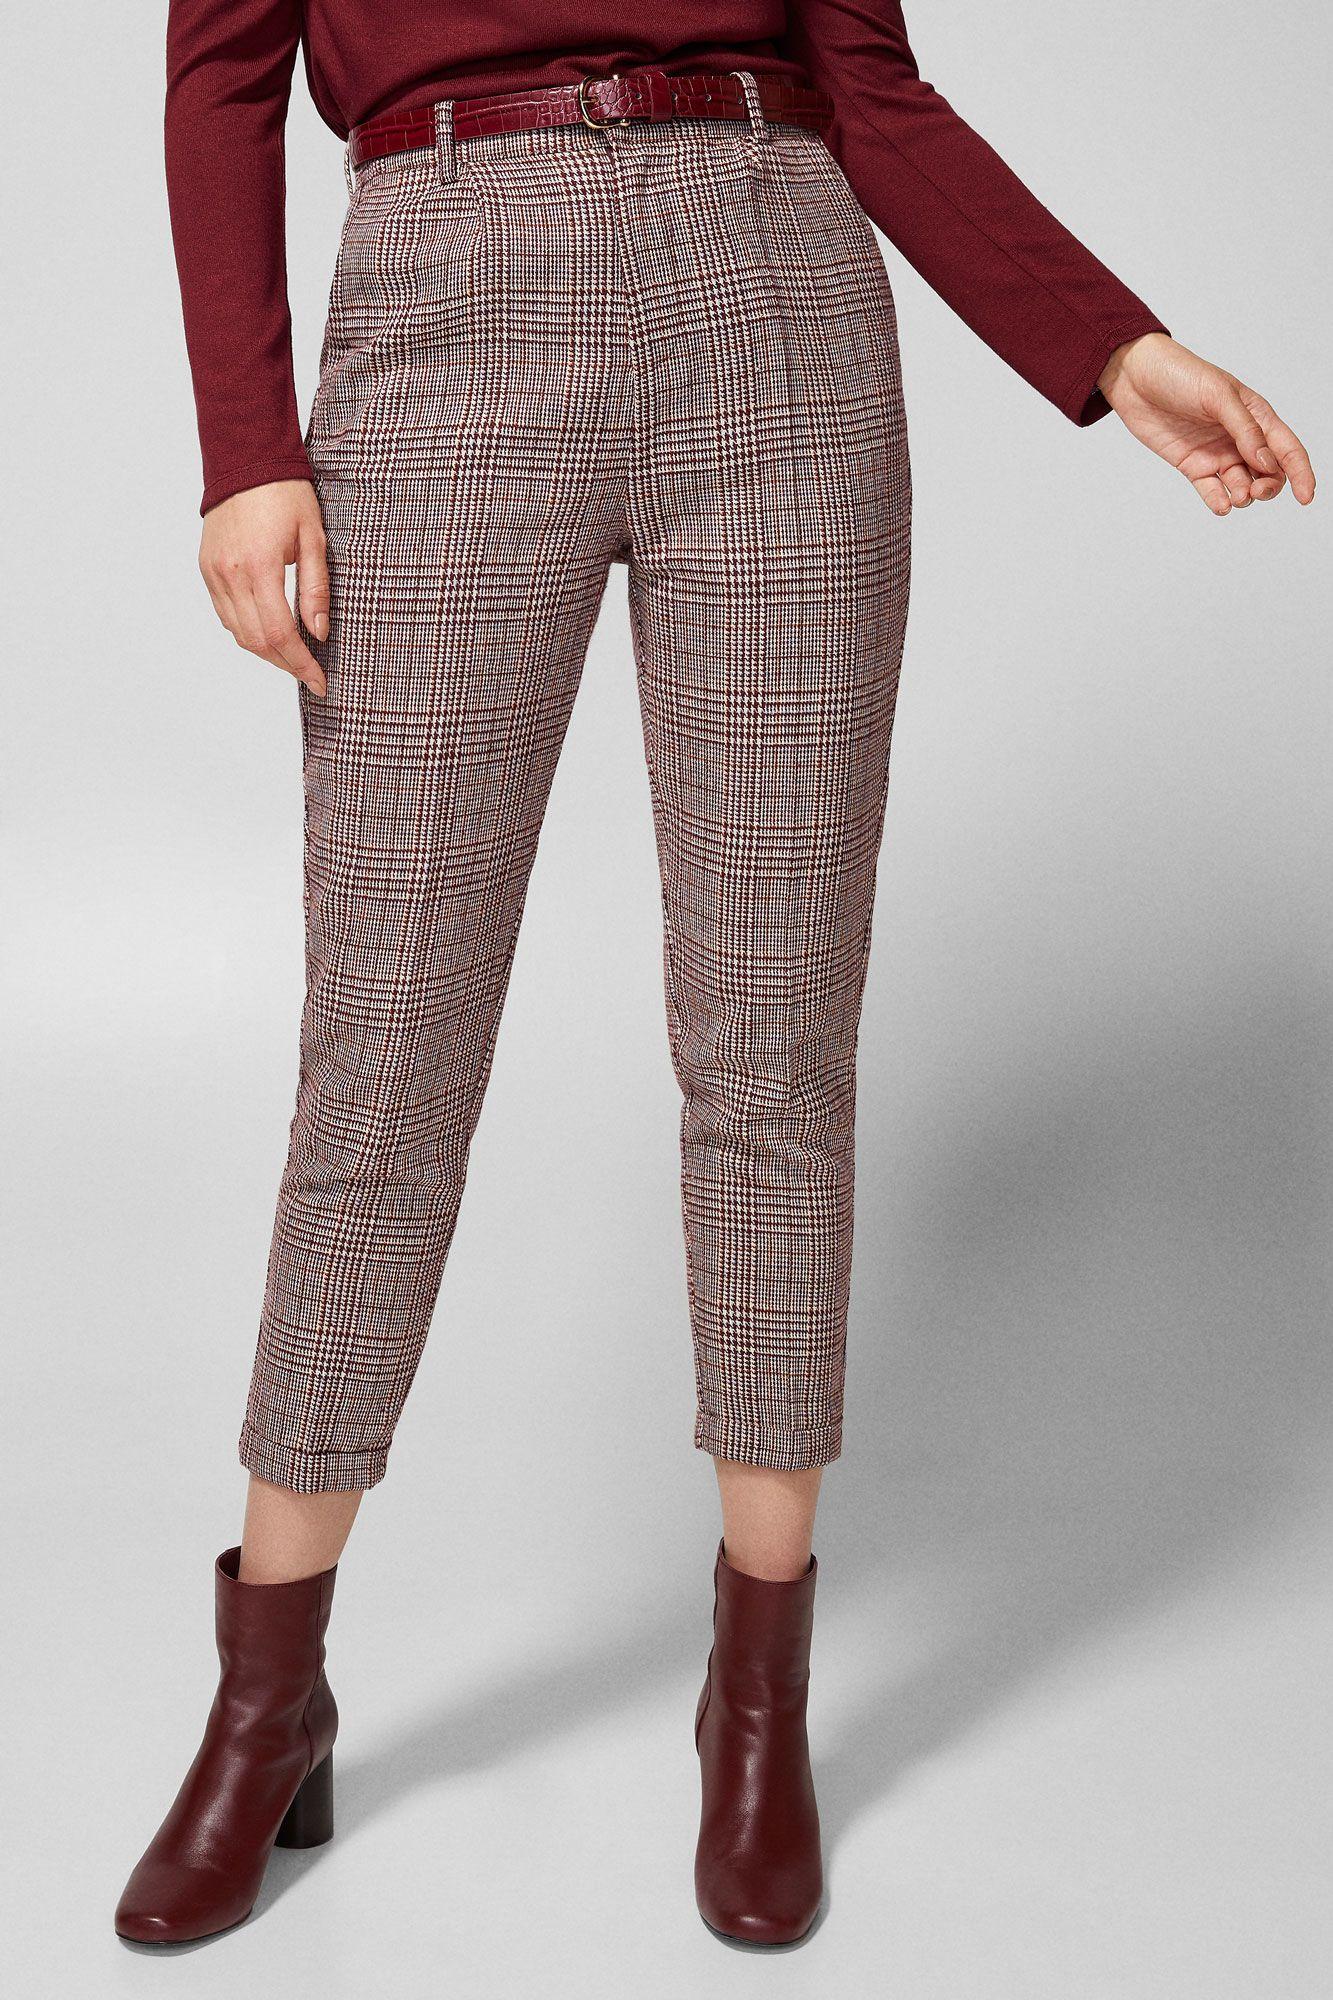 Springfield Pantalon Cuadro Granate Lila Pantalones De Cuadros Pantalones Mujer Ropa De Moda